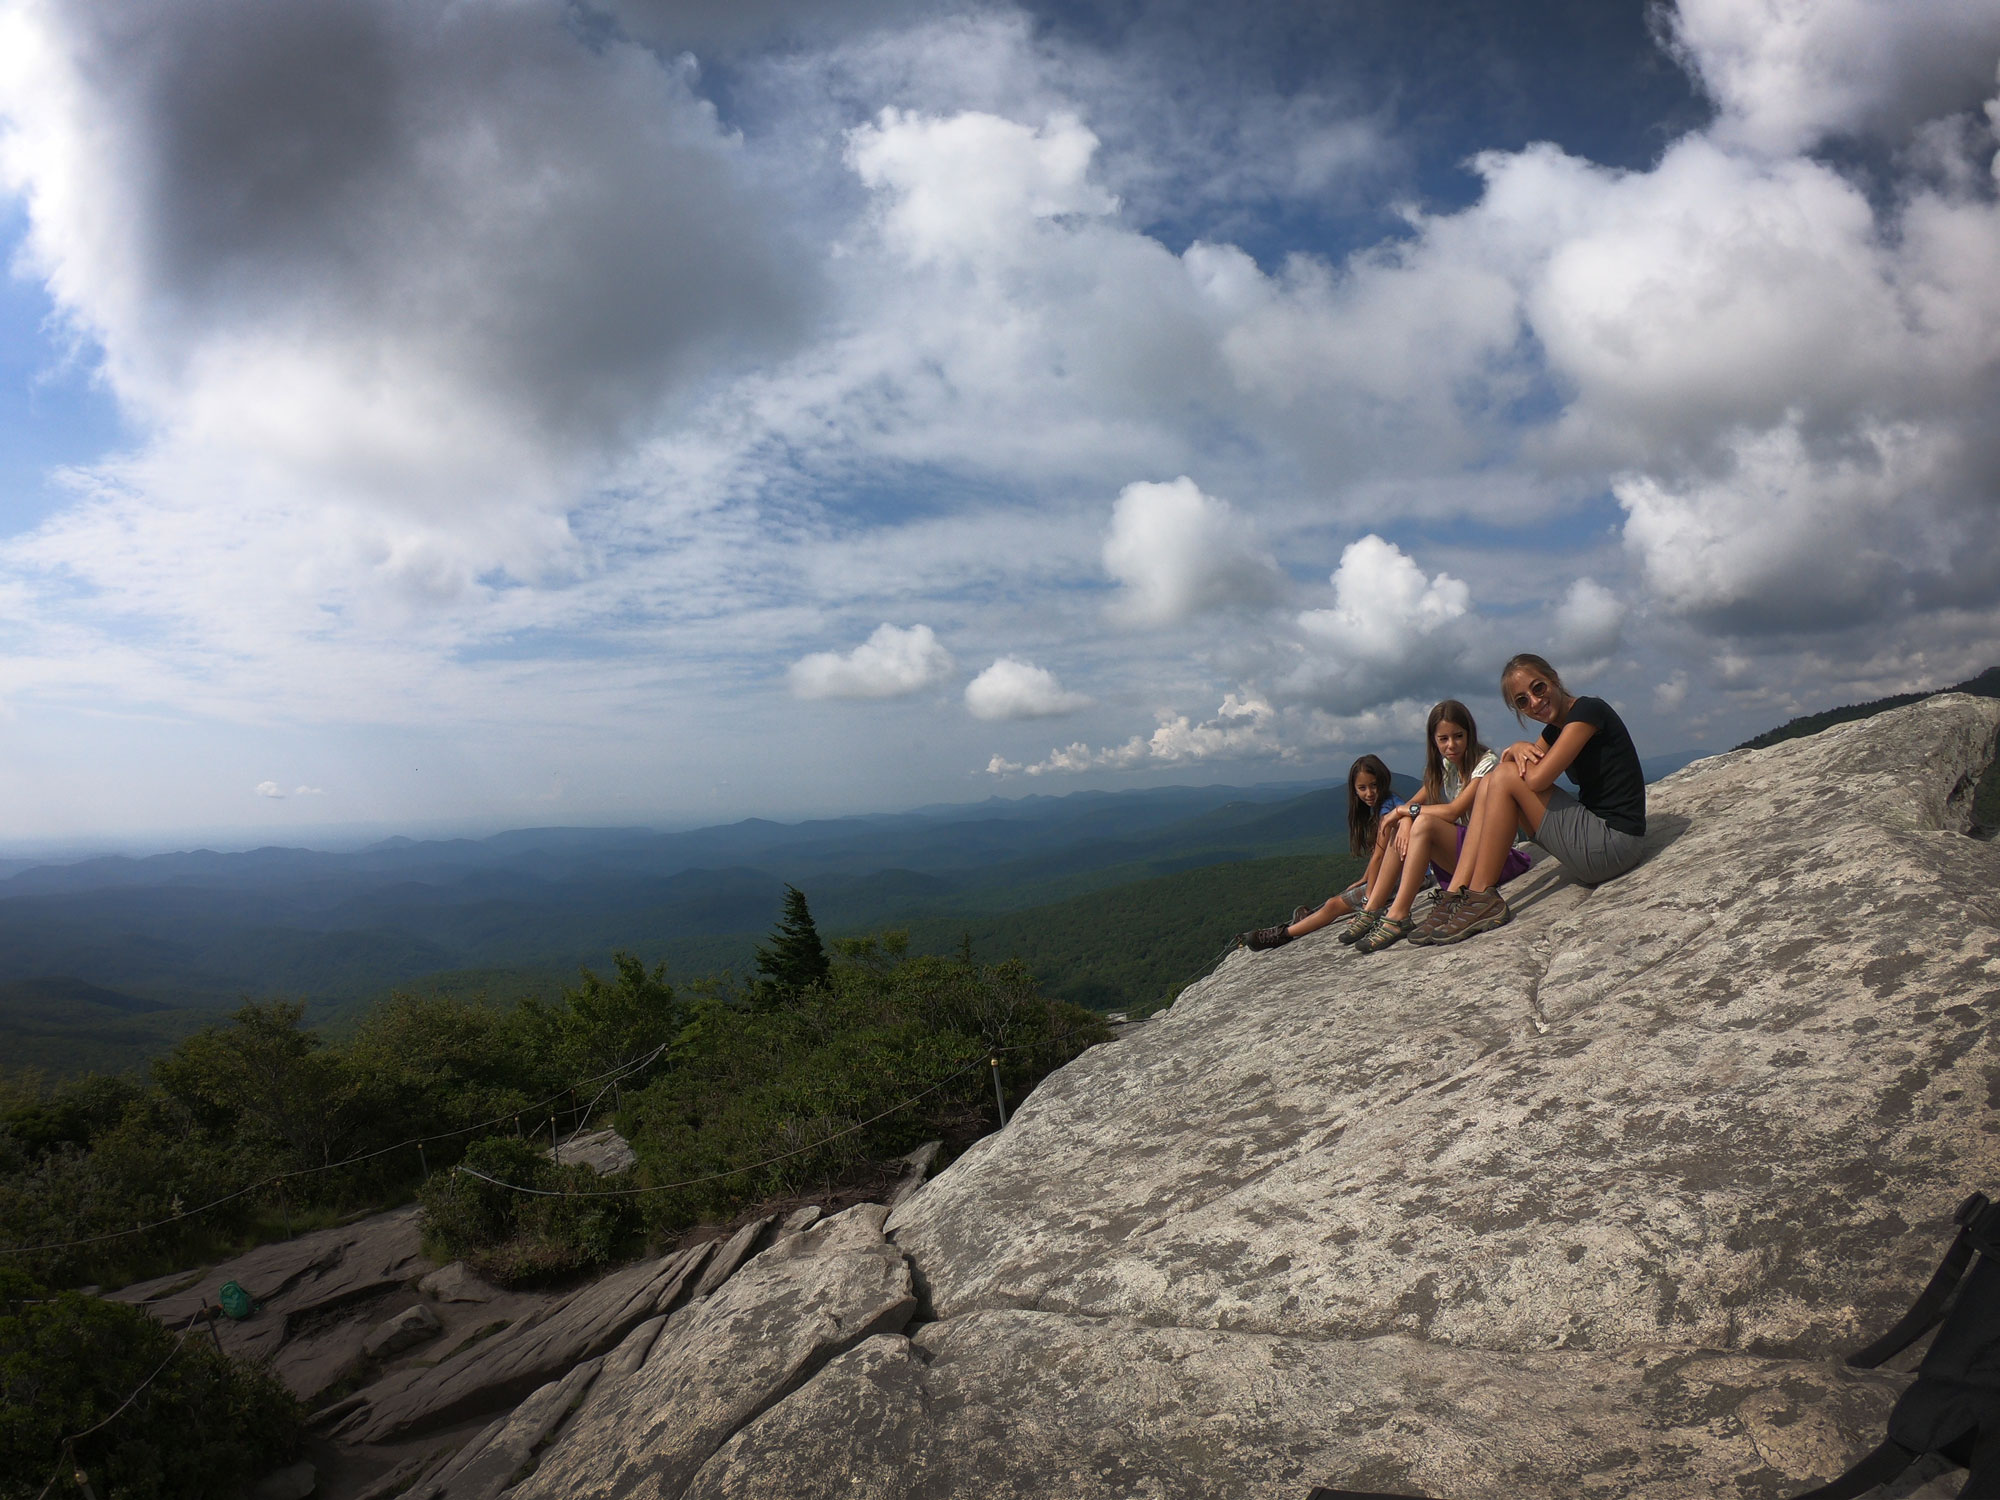 Three kids hiking and sitting at the Rough Ridge summit rocks, off Blue Ridge Parkway, North Carolina